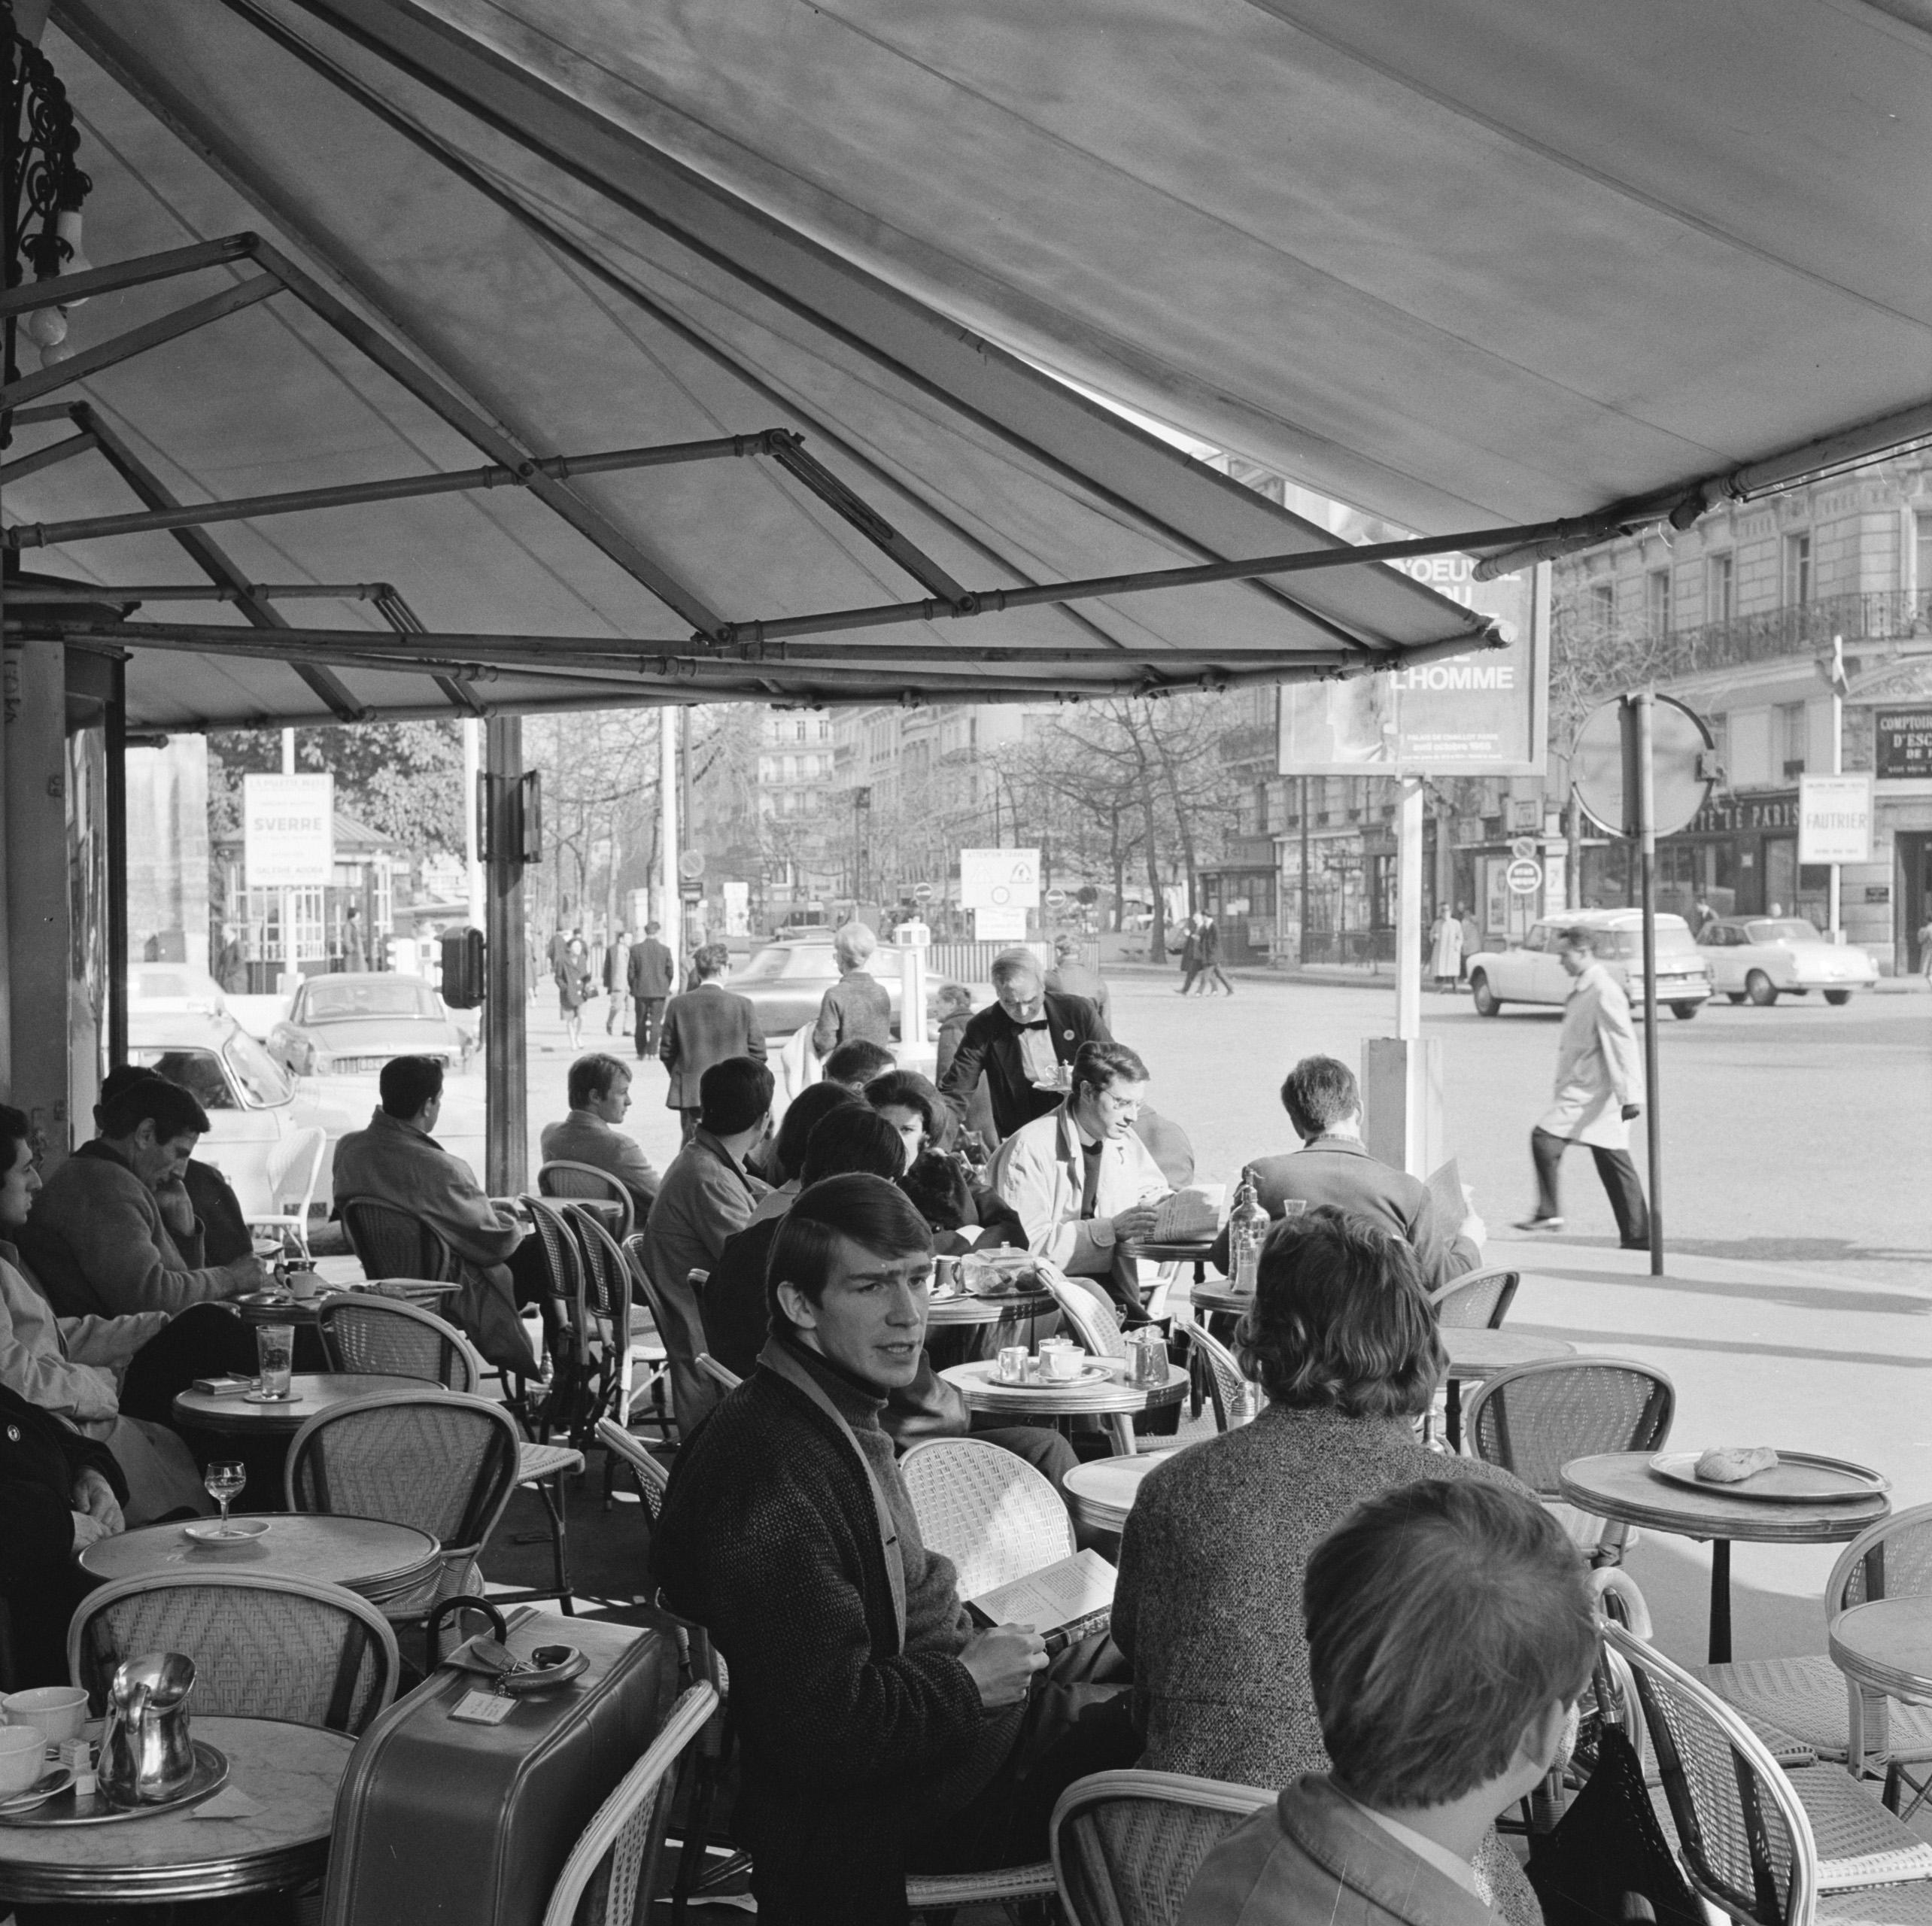 Restaurant Caf Ef Bf Bd De La Poste La Bouille Menu